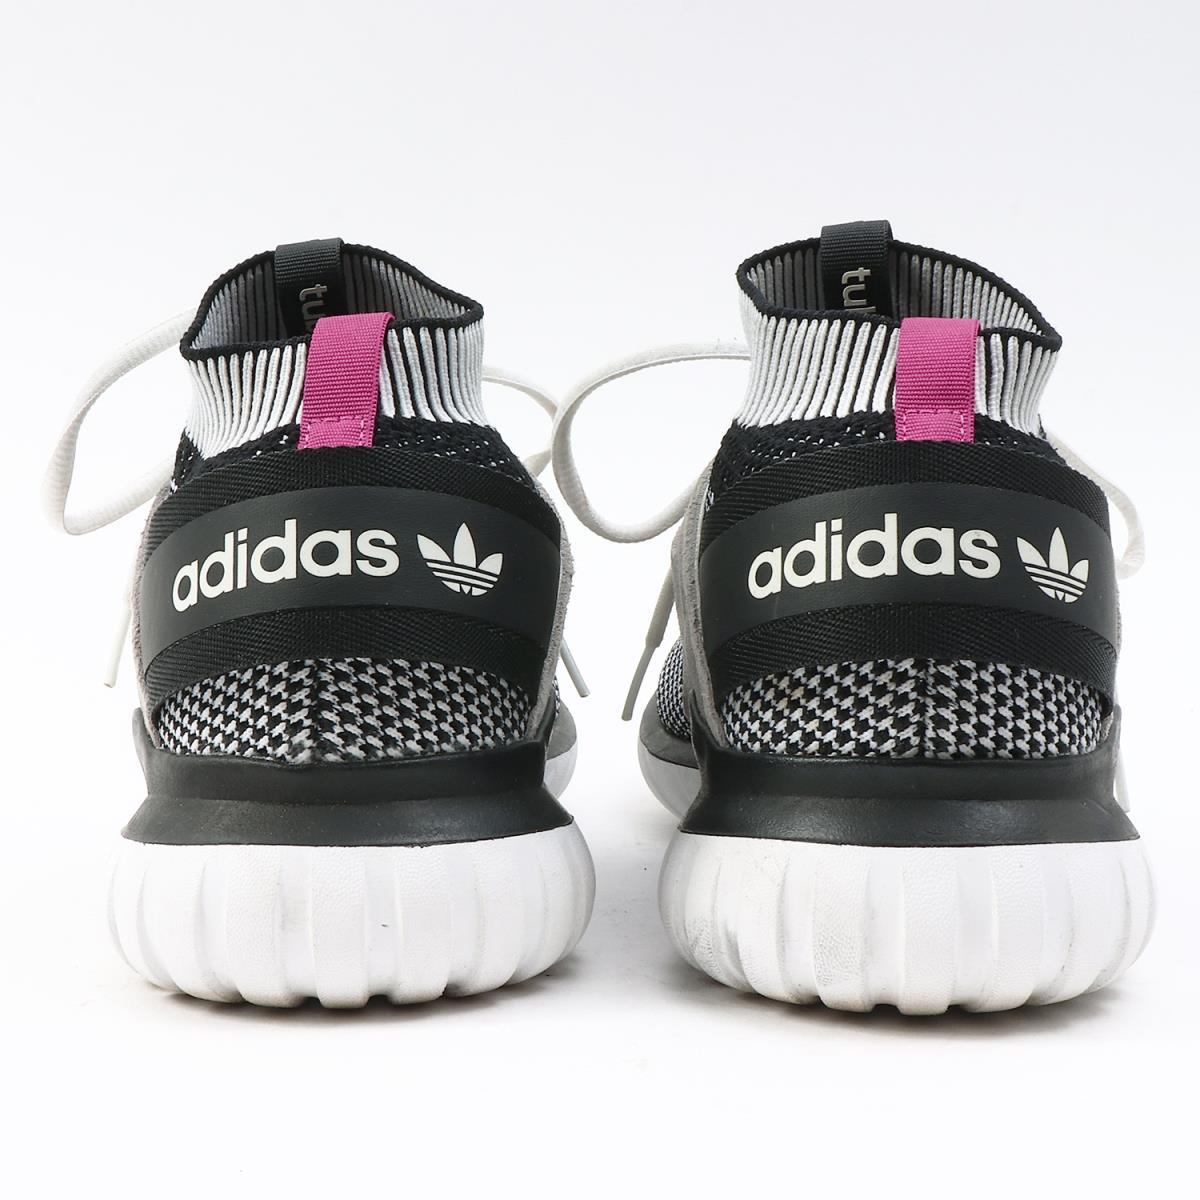 huge discount 26d9f 4c438 adidas (Adidas) 16S/S TUBULARNOVA (S74918) black X gray US9(27cm)